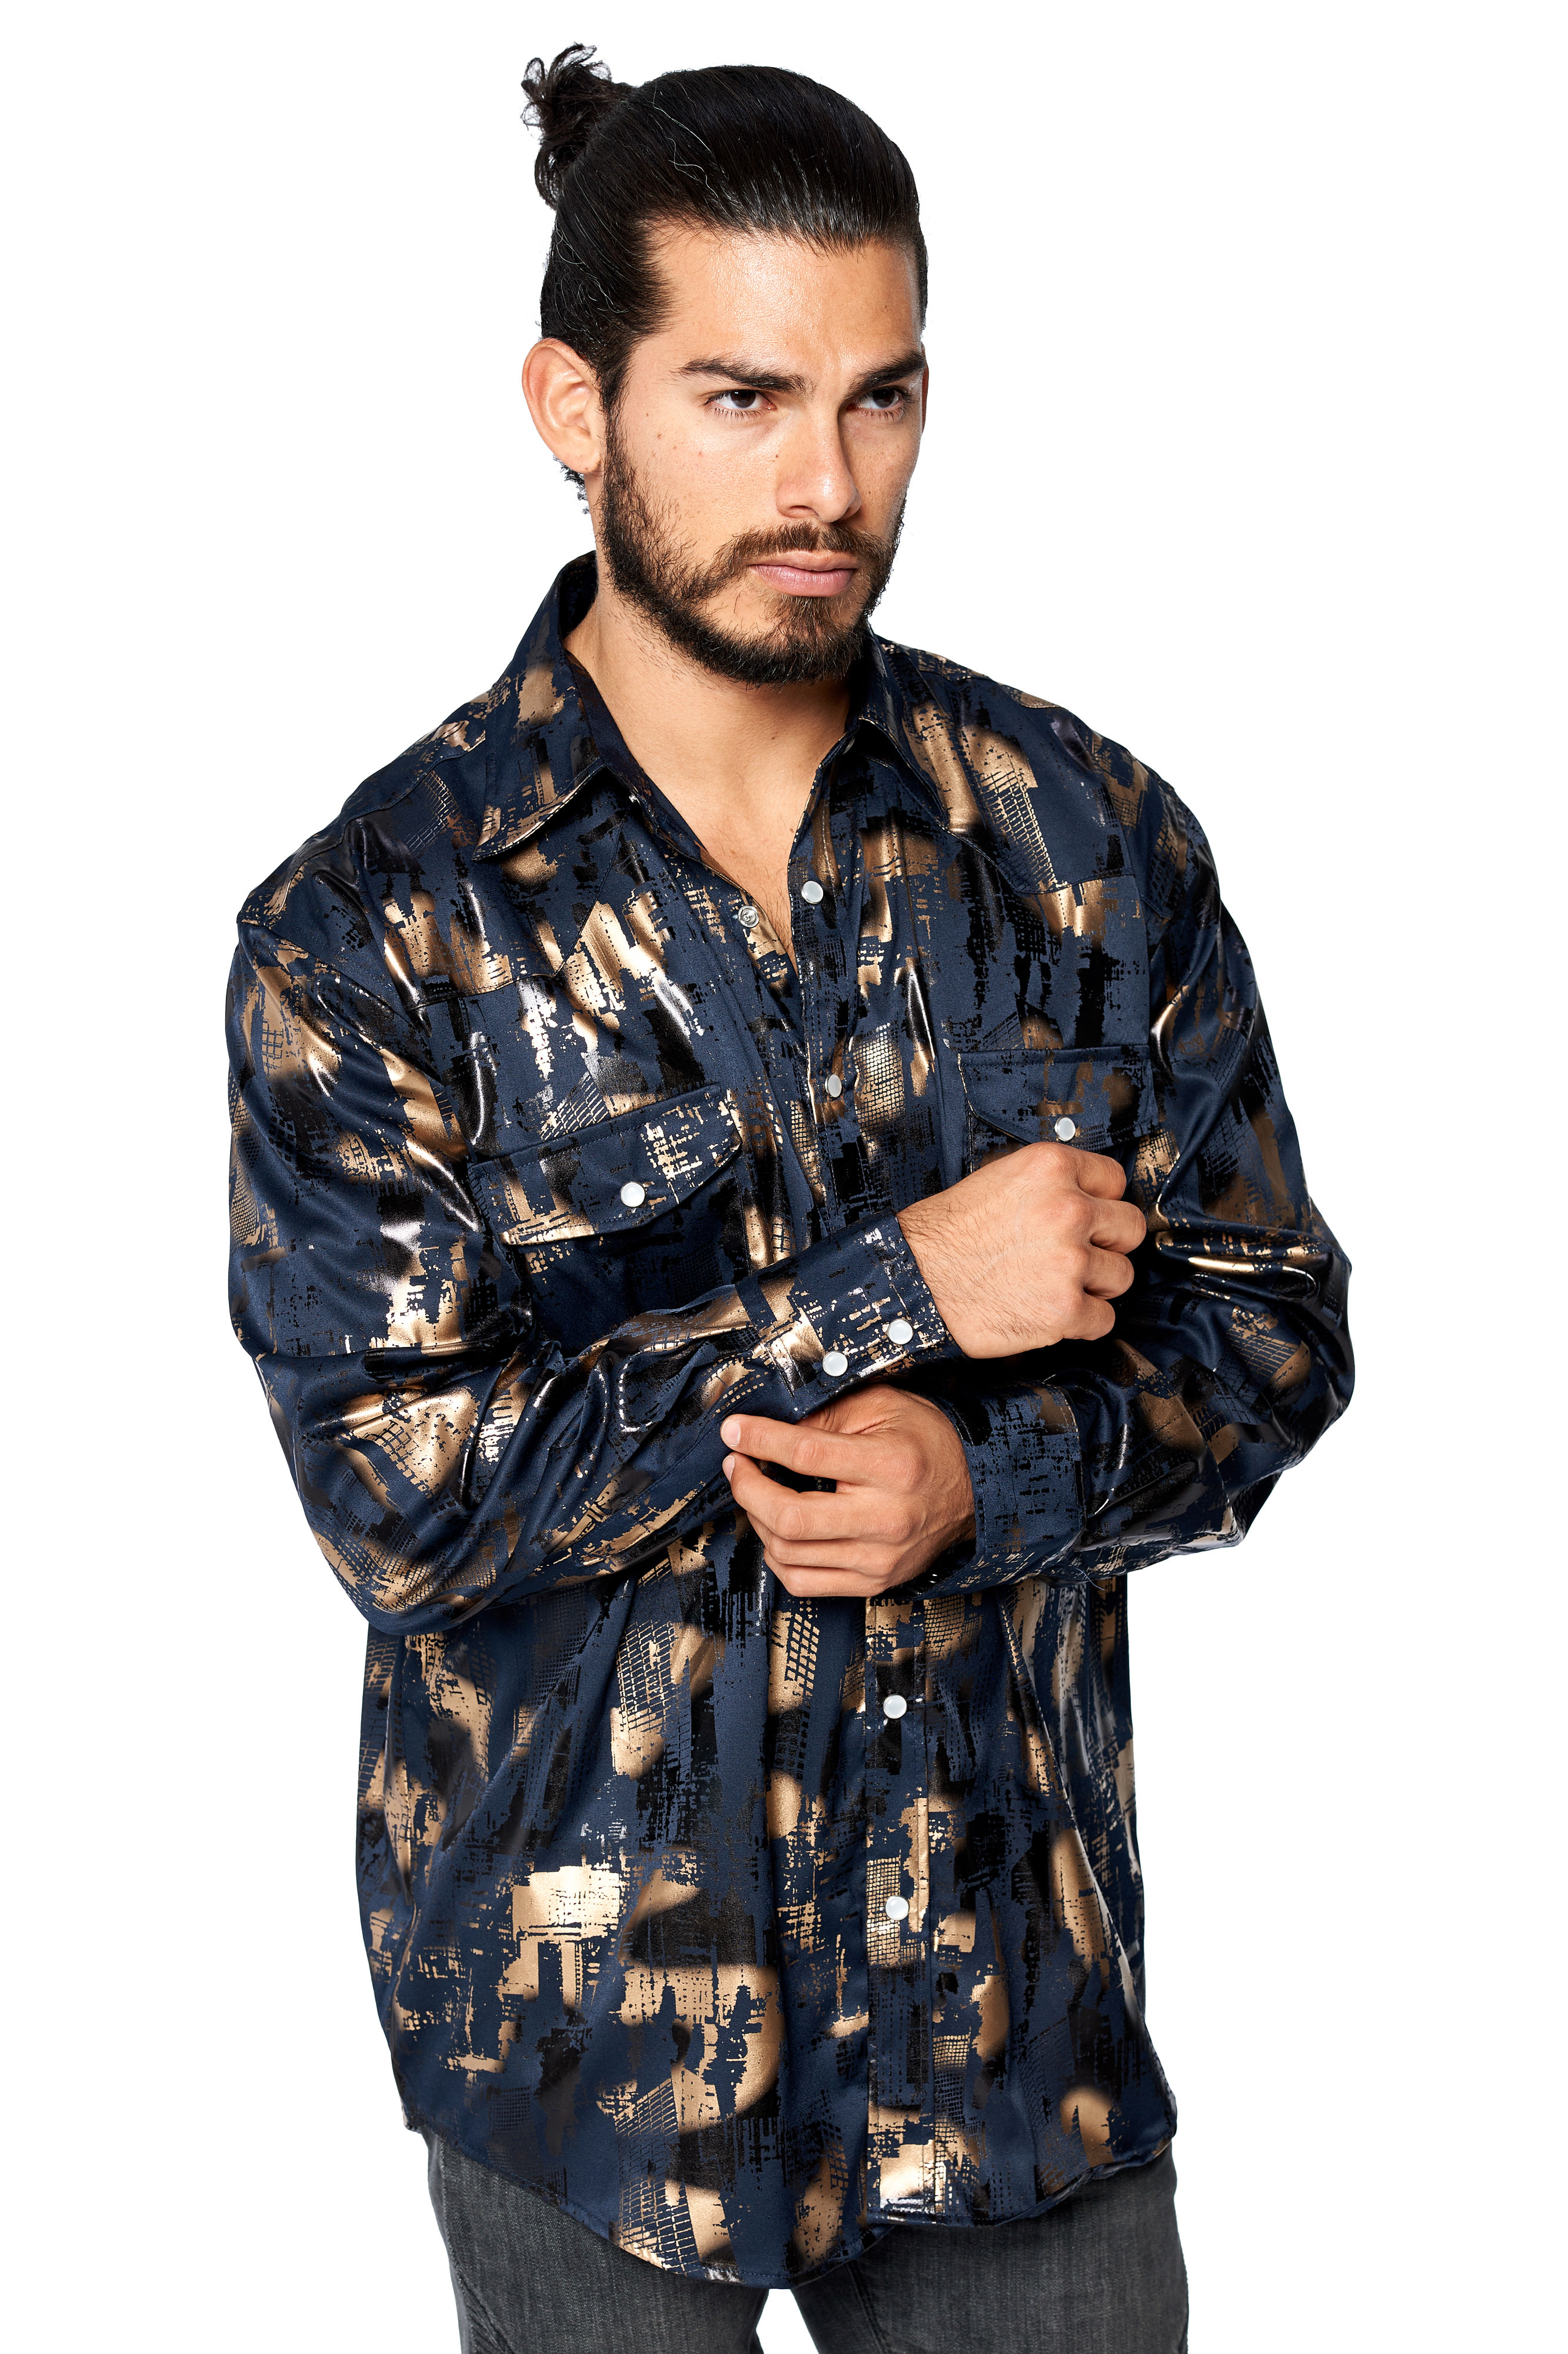 LW-Men-039-s-Pearl-Snap-Tribal-Stylish-Printed-Woven-Western-Vaquero-Rodeo-Shirt thumbnail 26